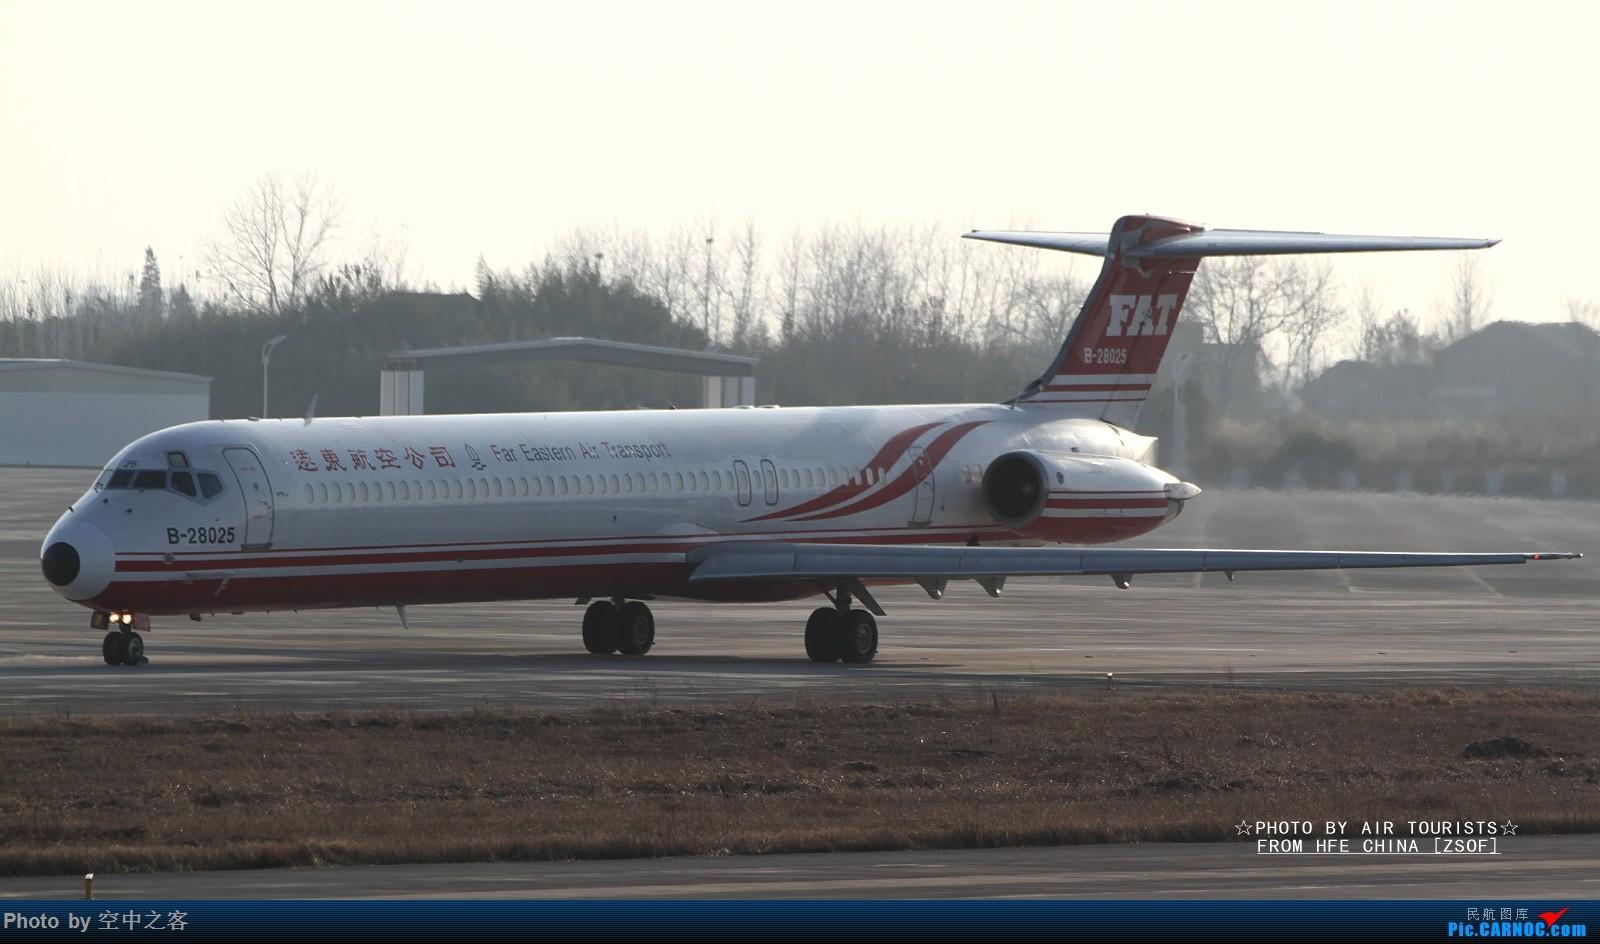 Re:[原创][空中之客 HFE出品]听拐爷的别任性好天拍机去 嘿嘿 MD MD-80-83 B-28025 合肥新桥国际机场